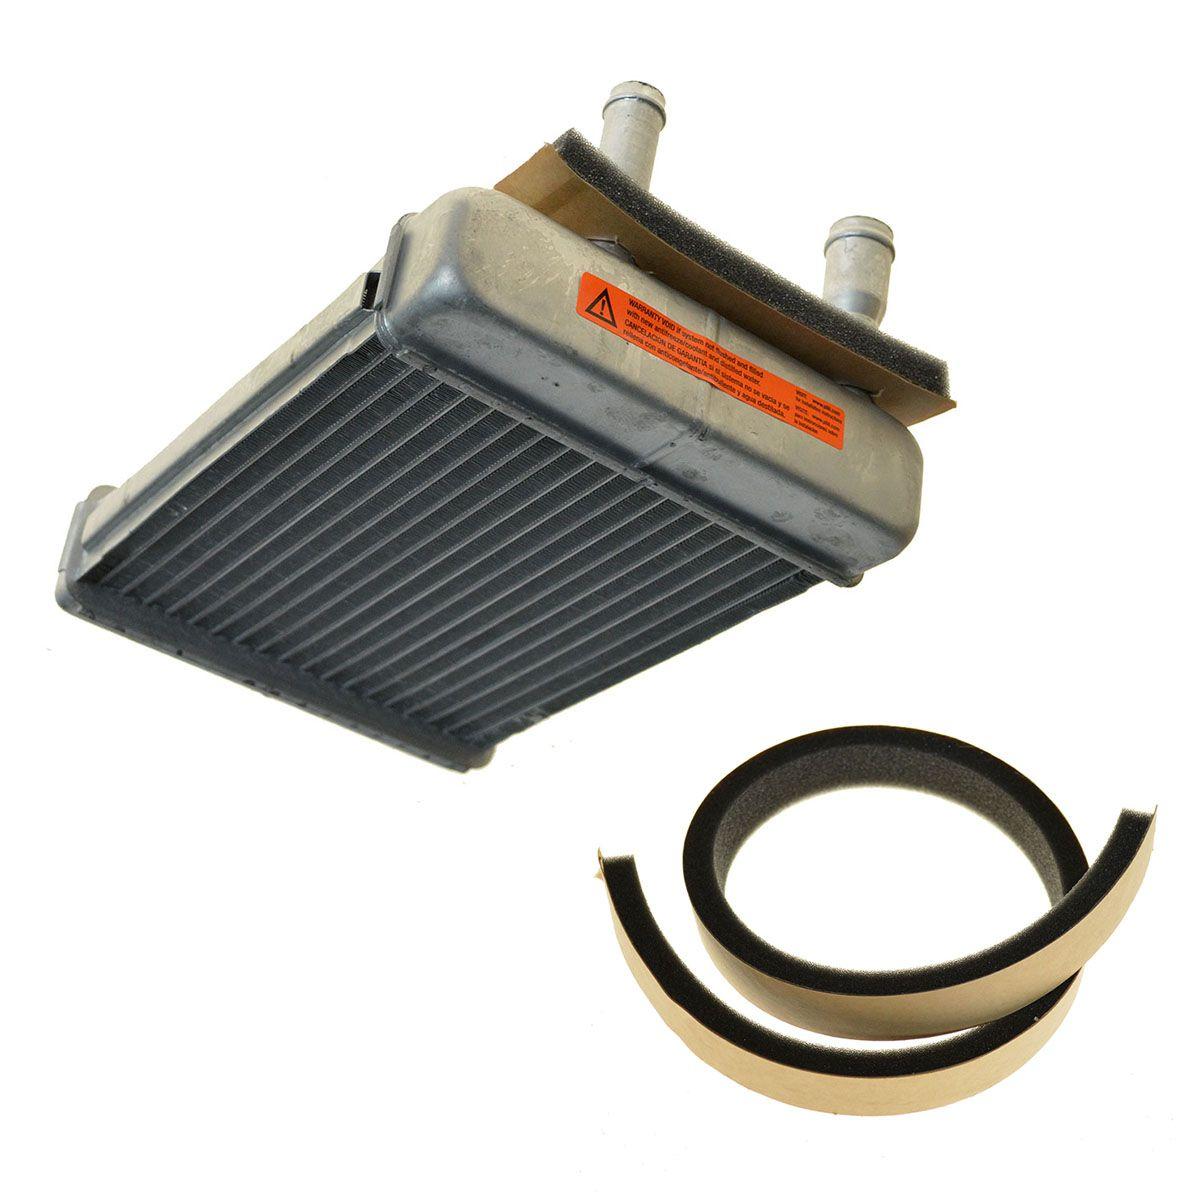 Service Manual 1996 Mazda Mx 3 Heater Core Replacement: Service Manual [1997 Chevrolet Suburban 1500 Heater Motor